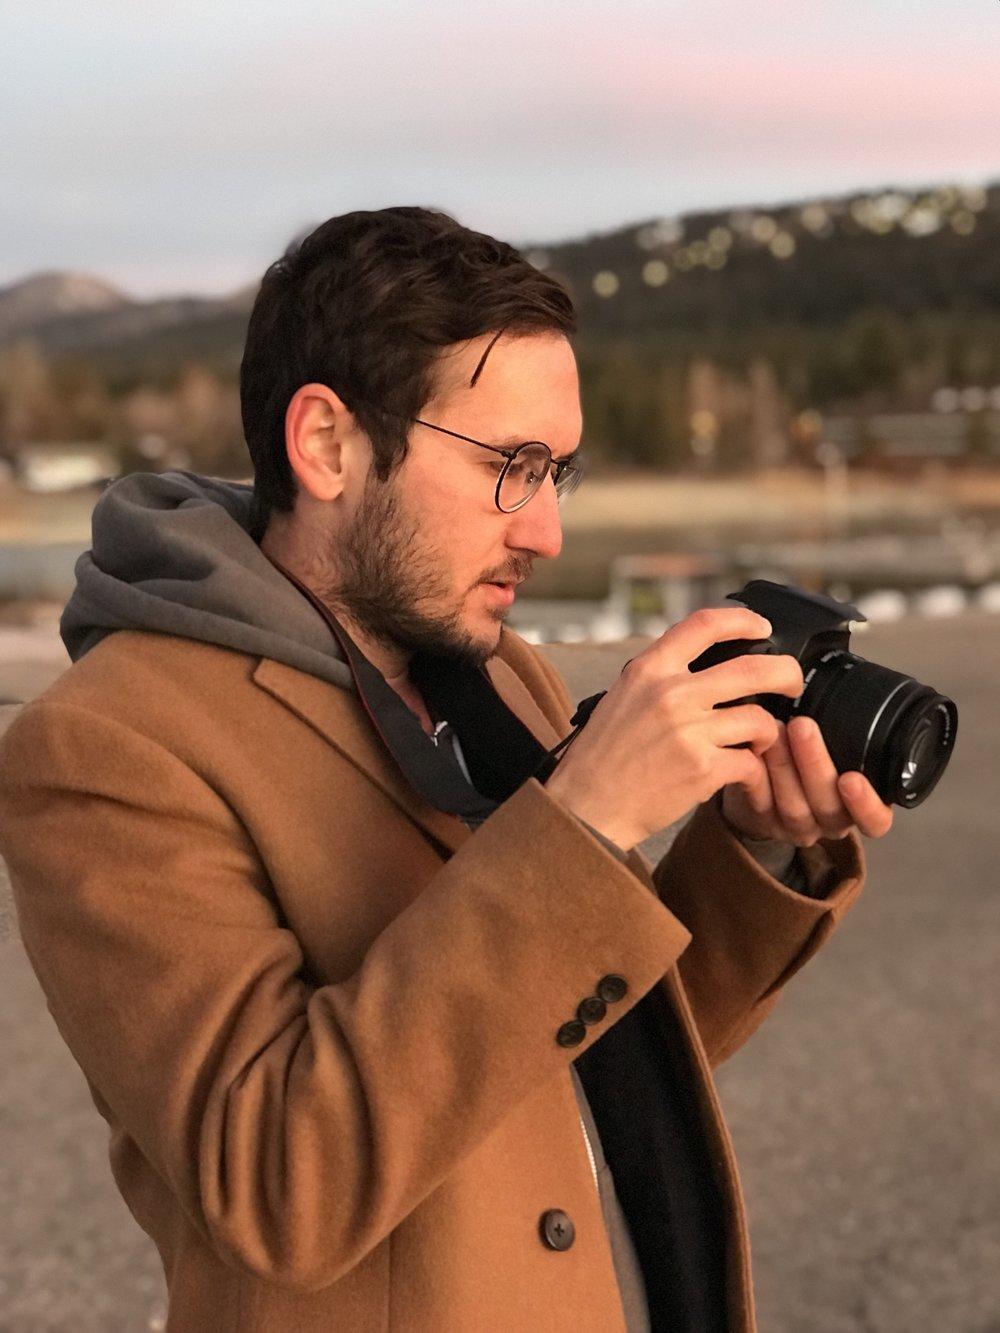 Accounting student Eli Bokori enjoying one of his passions, photography. Photo by Kris Tashjian